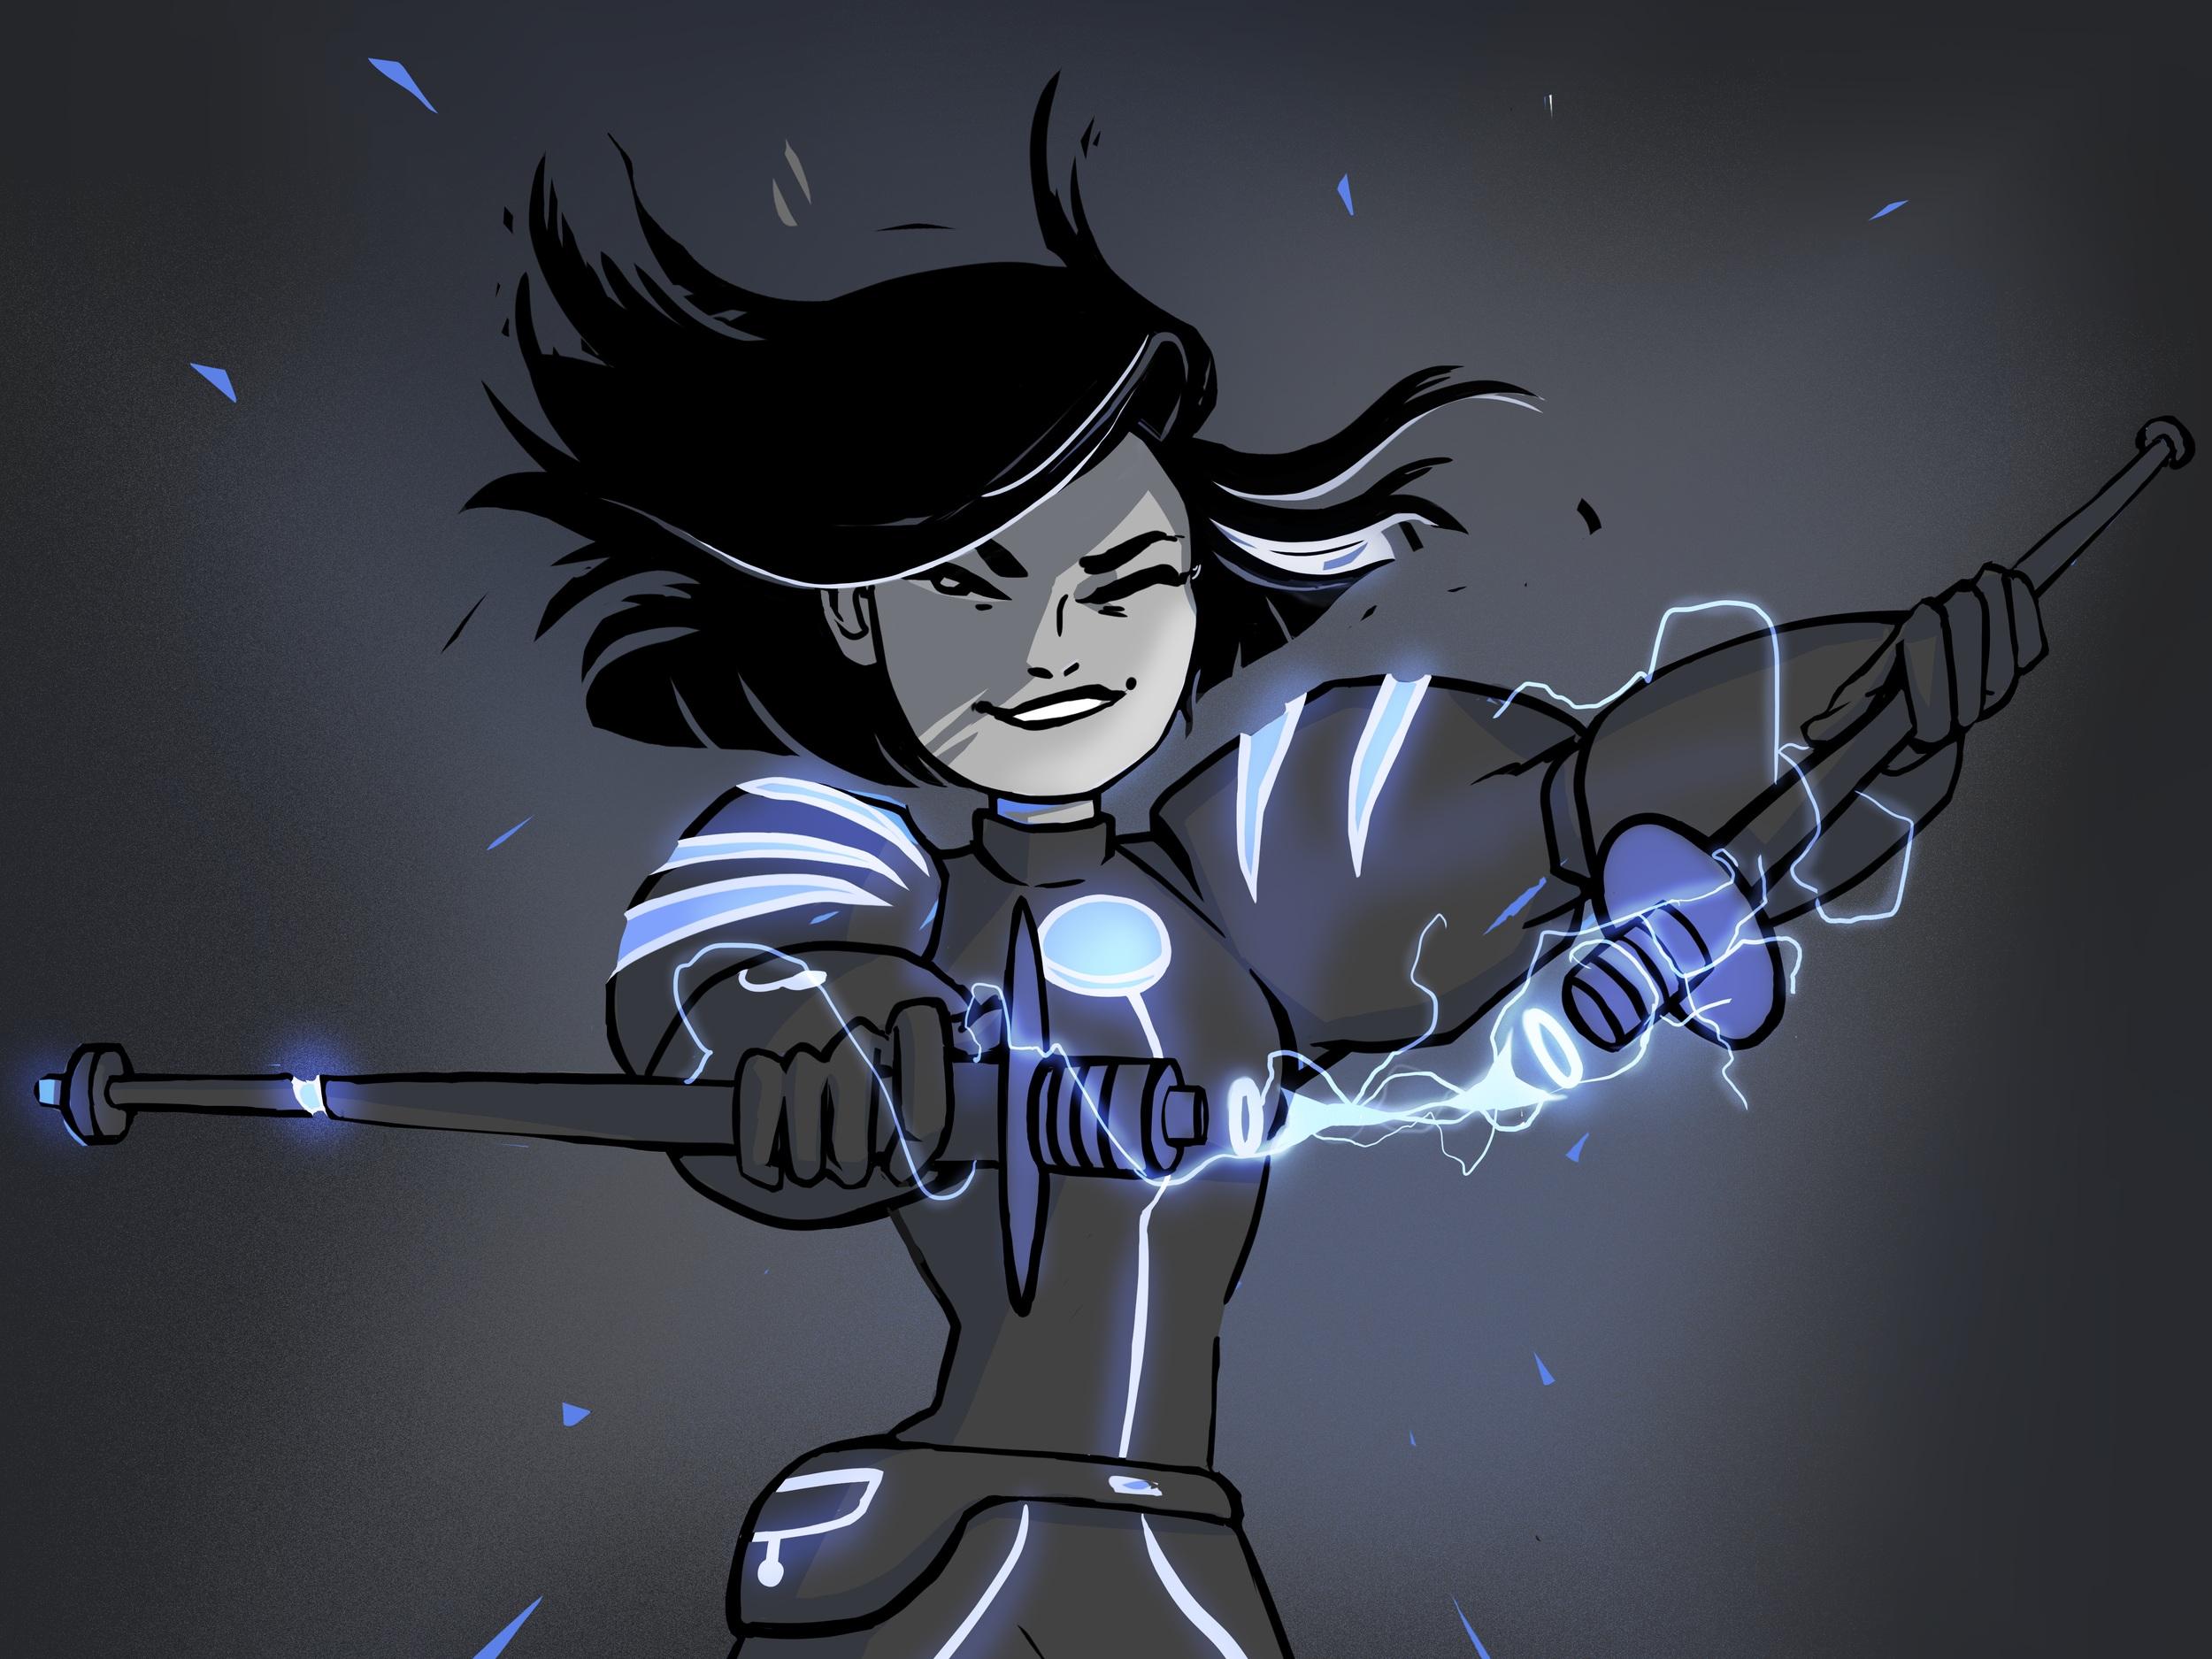 Scythe-hero-DanielaGamba-Eyewire.jpg